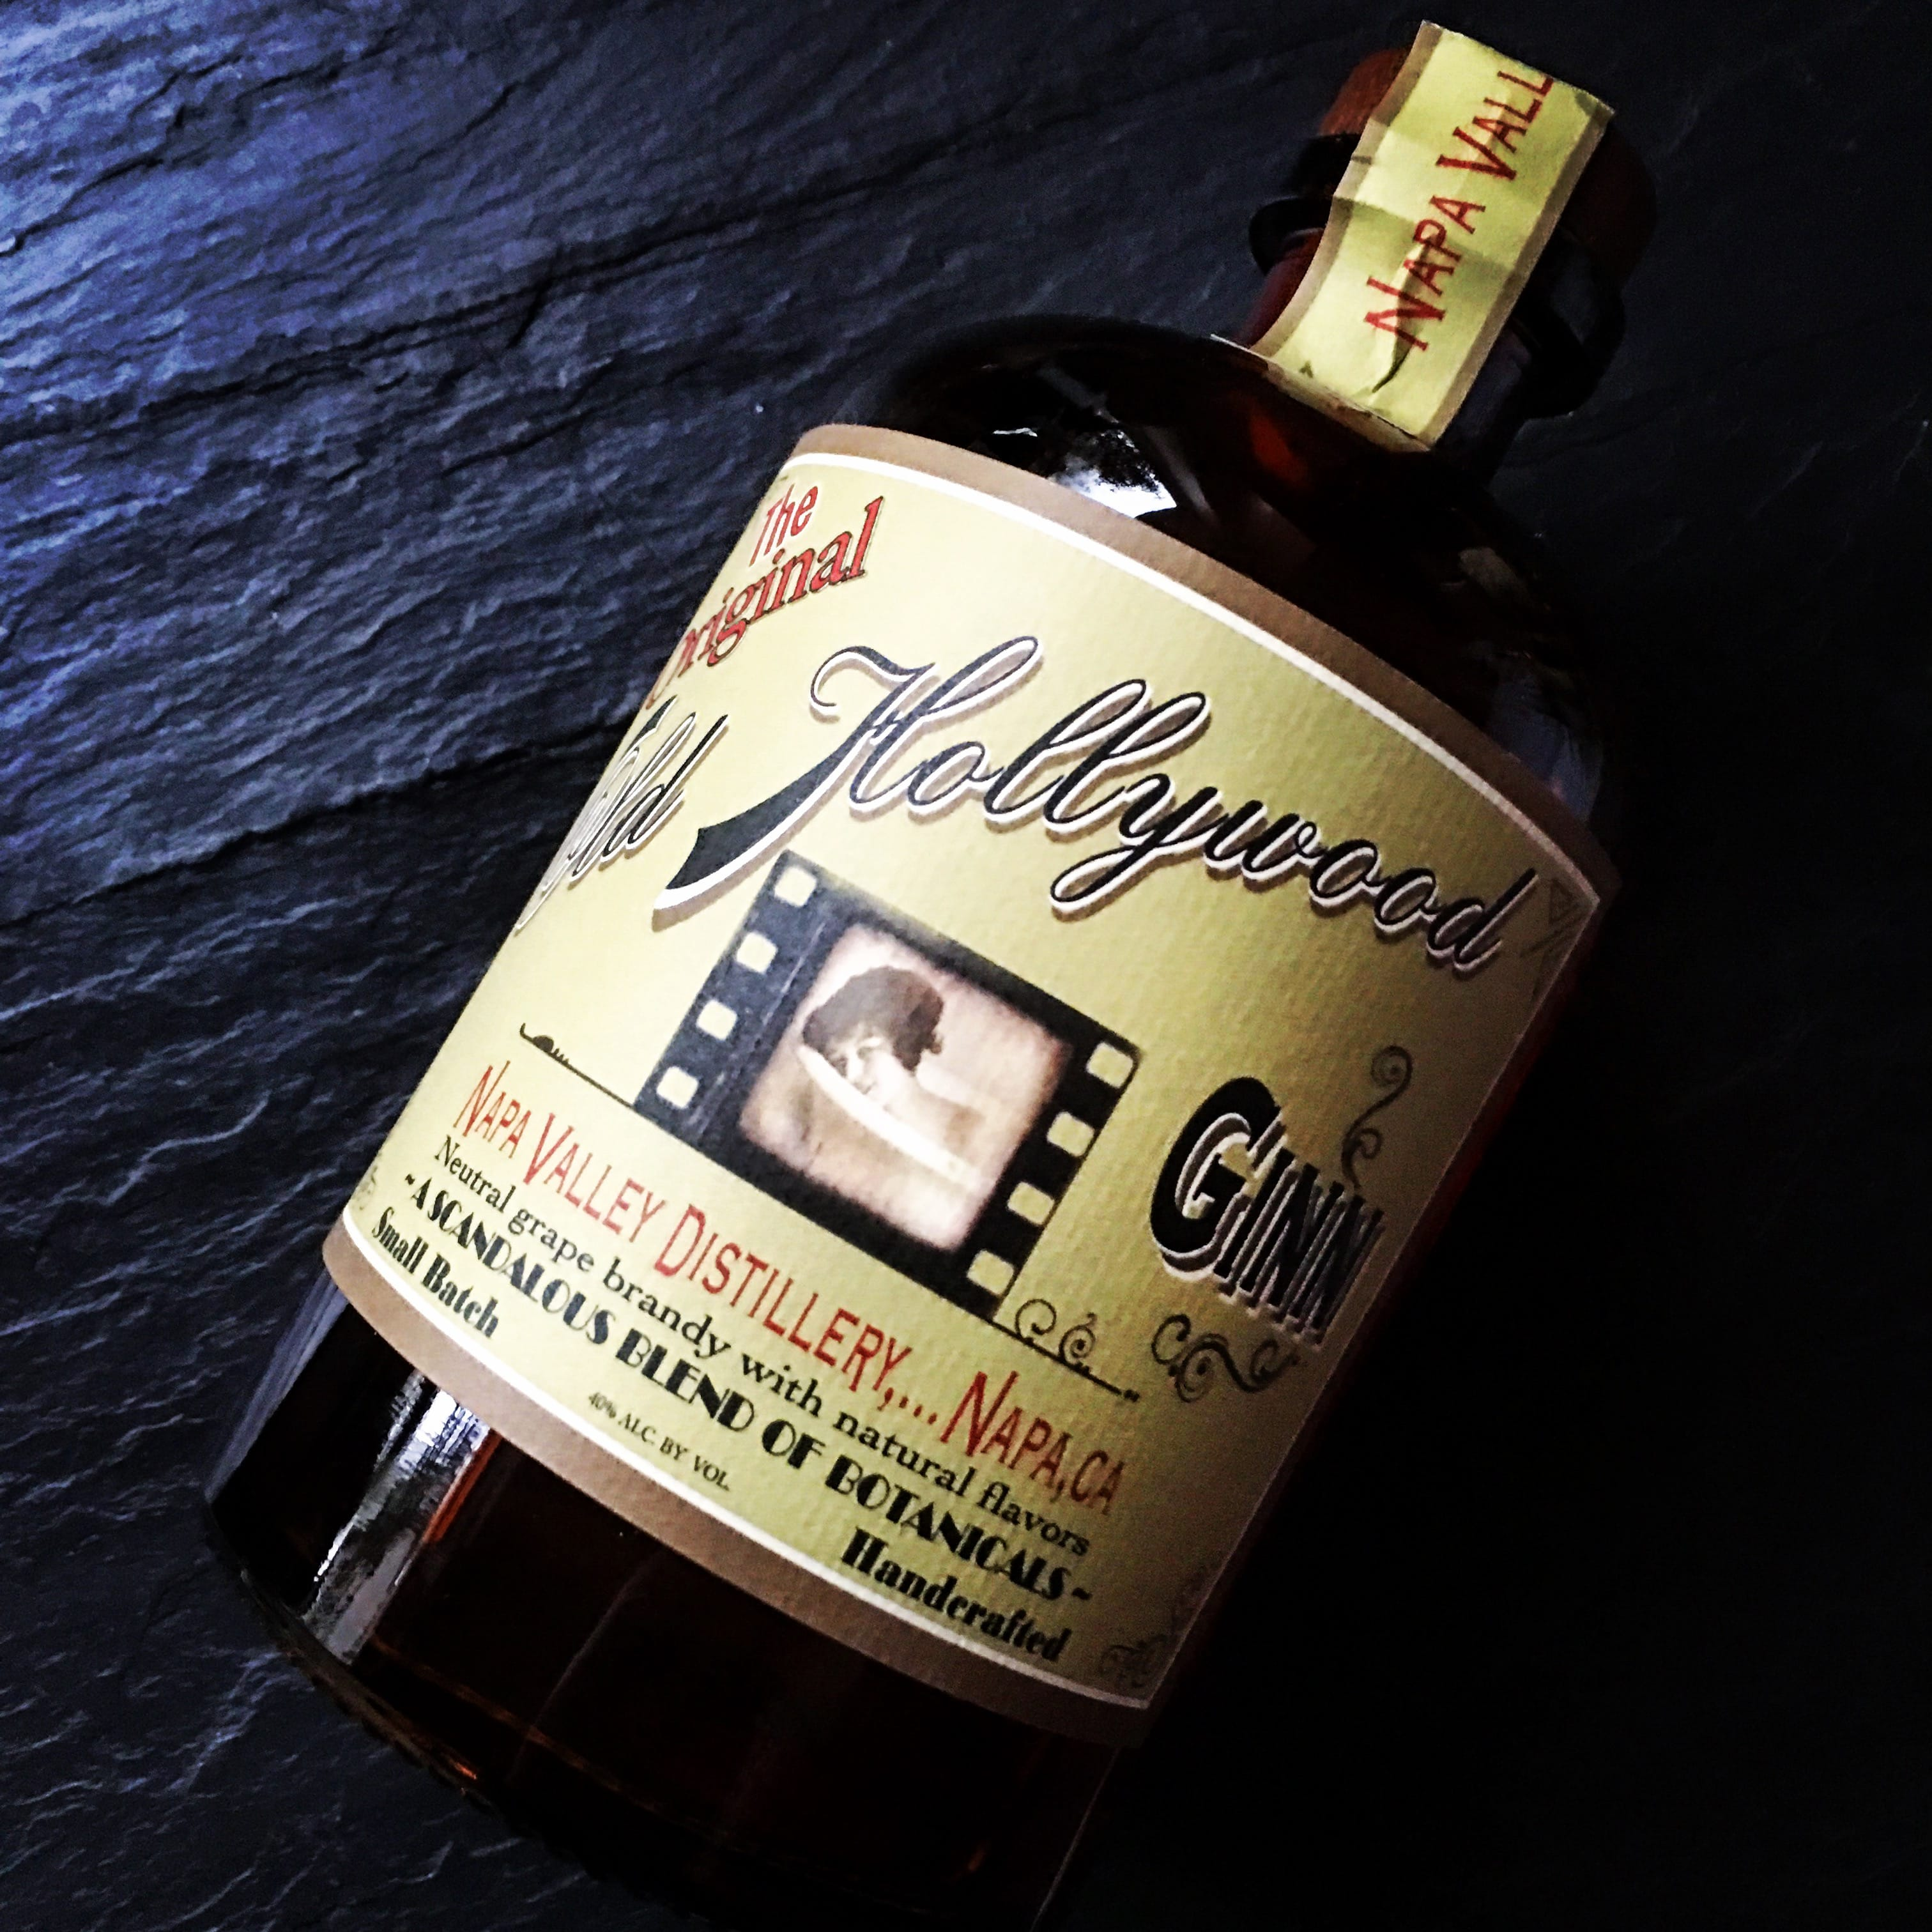 Napa Valley Distillery Old Hollywood Ginn